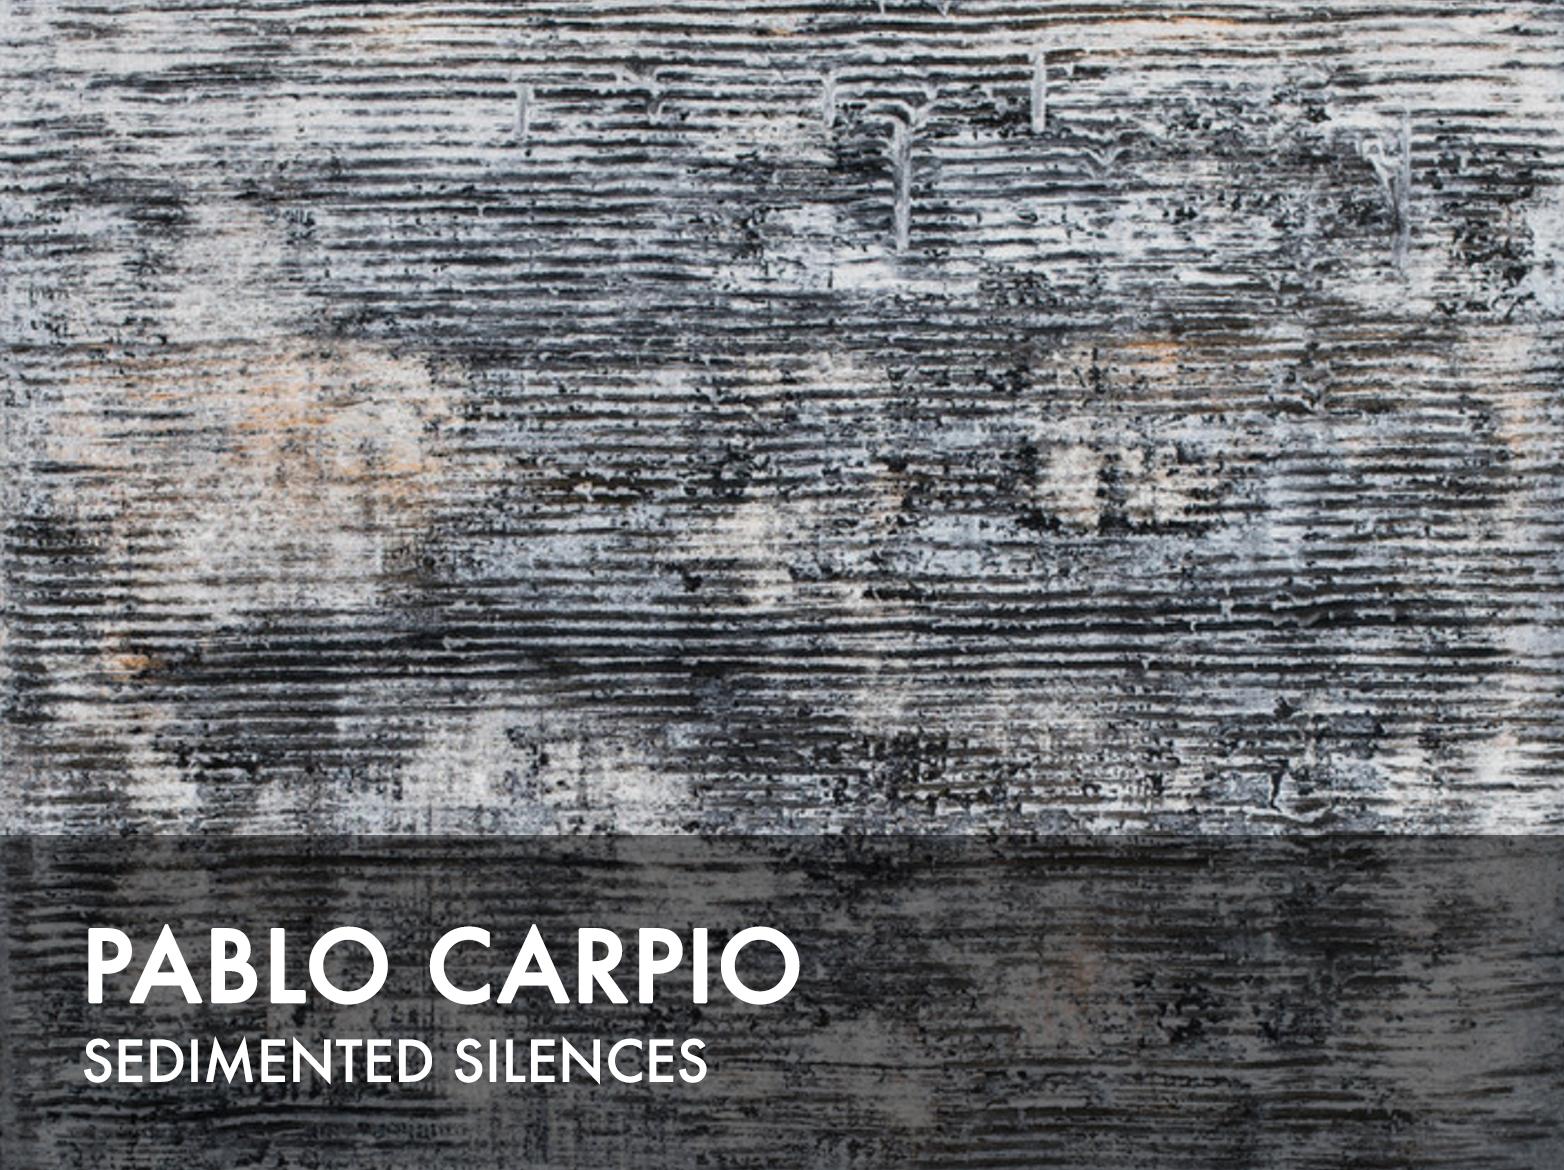 pablo_carpio_sedimented_silences